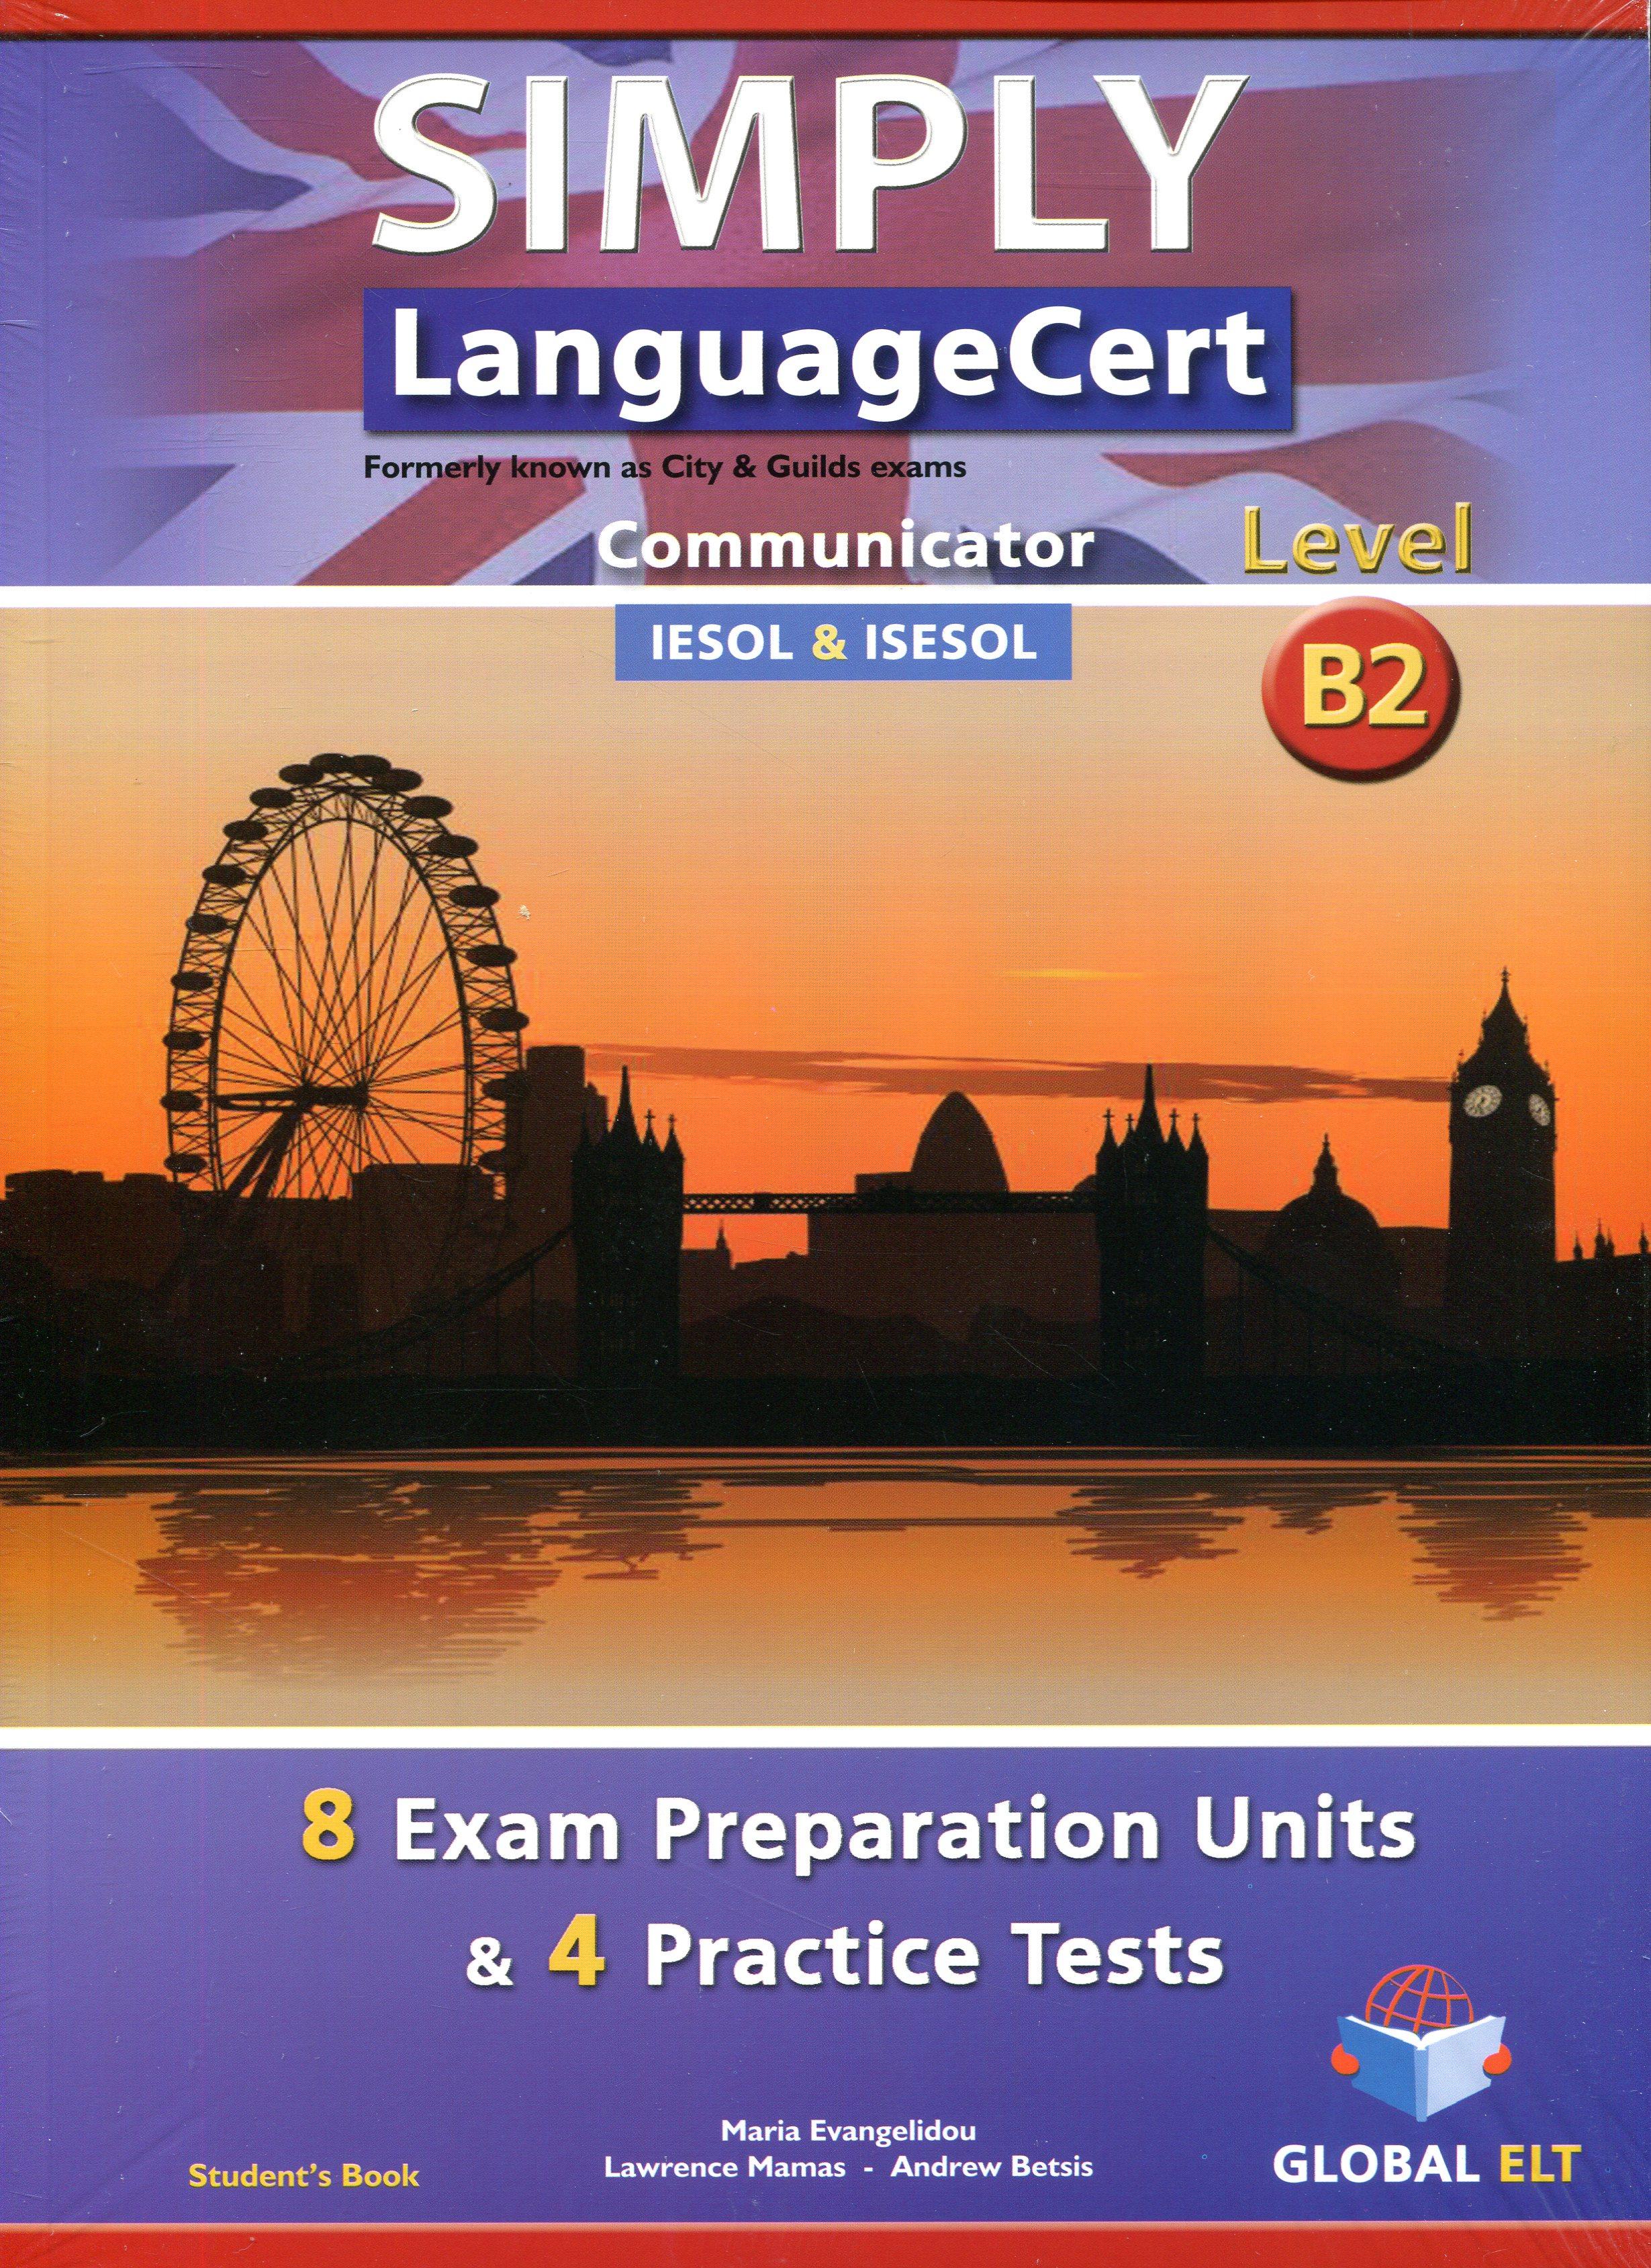 Simply LanguageCert Level B2 Communicator Student's Book - 8 Exam Preparation Units & 4 Practice Tests Self-study edition